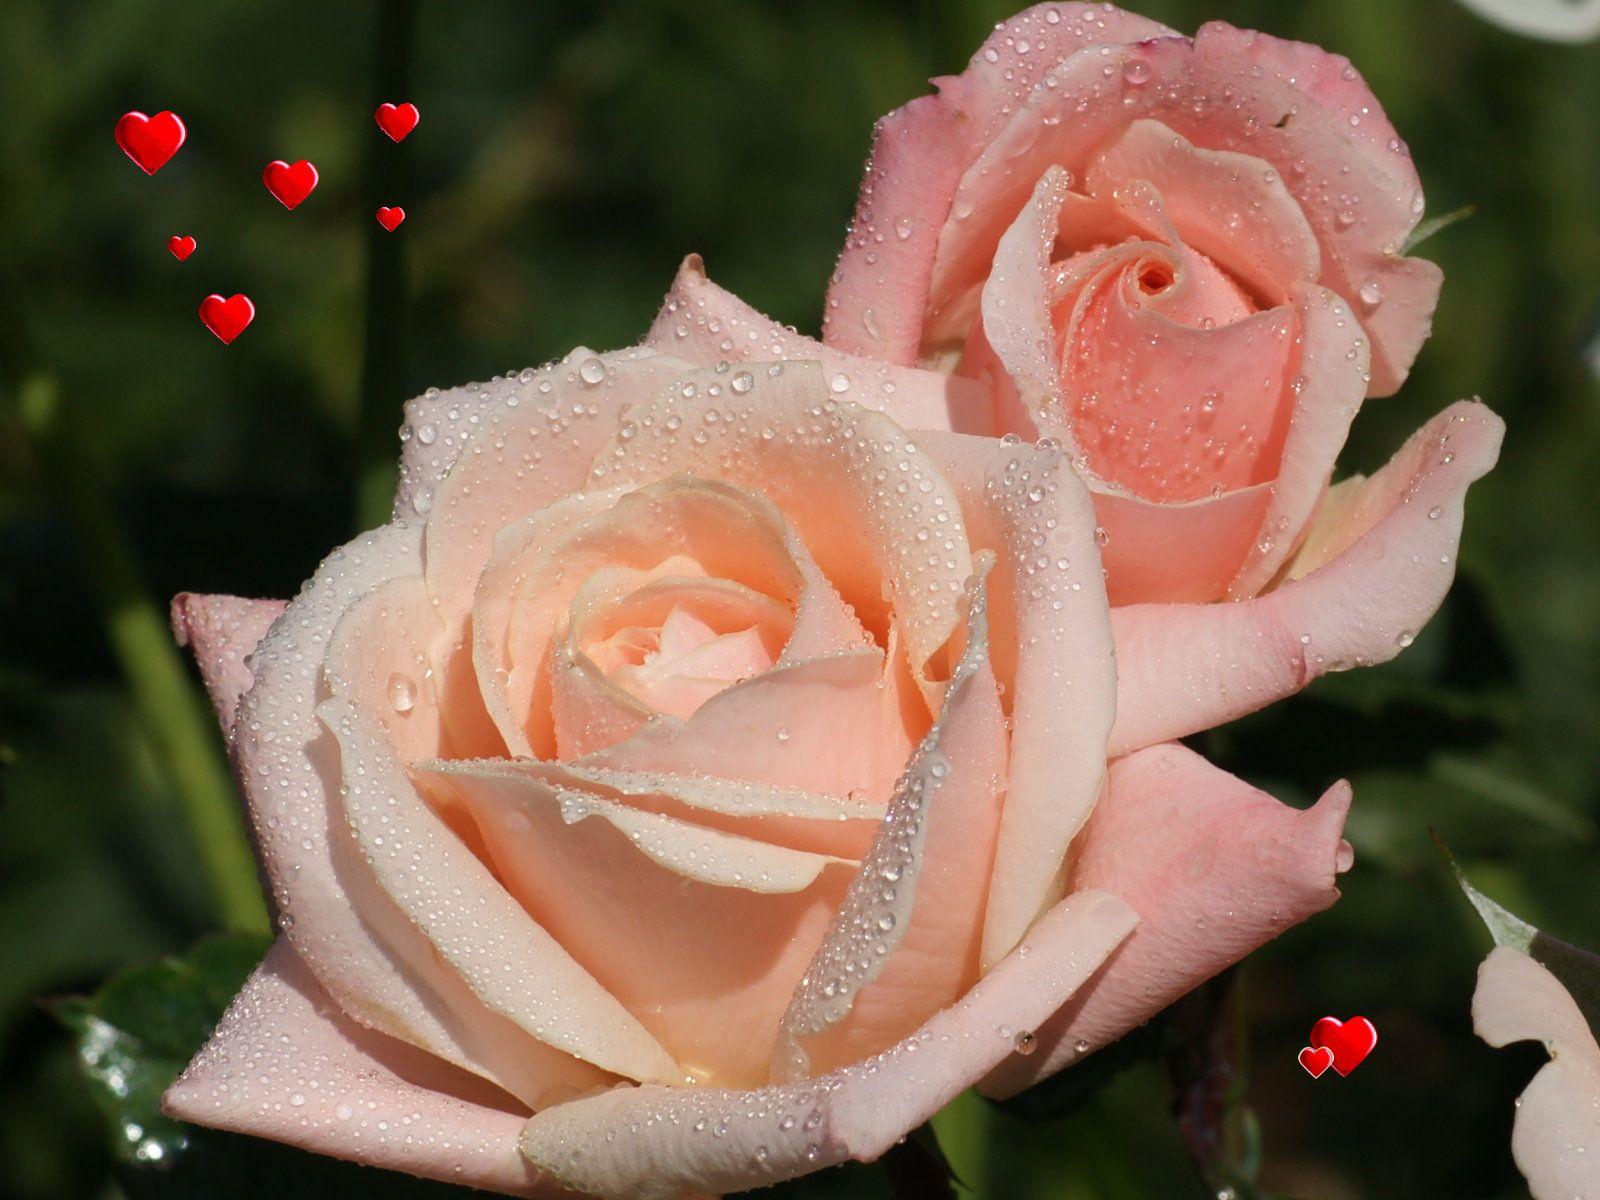 Love Wallpaper Valentine Roses 1600x1200px 1080p